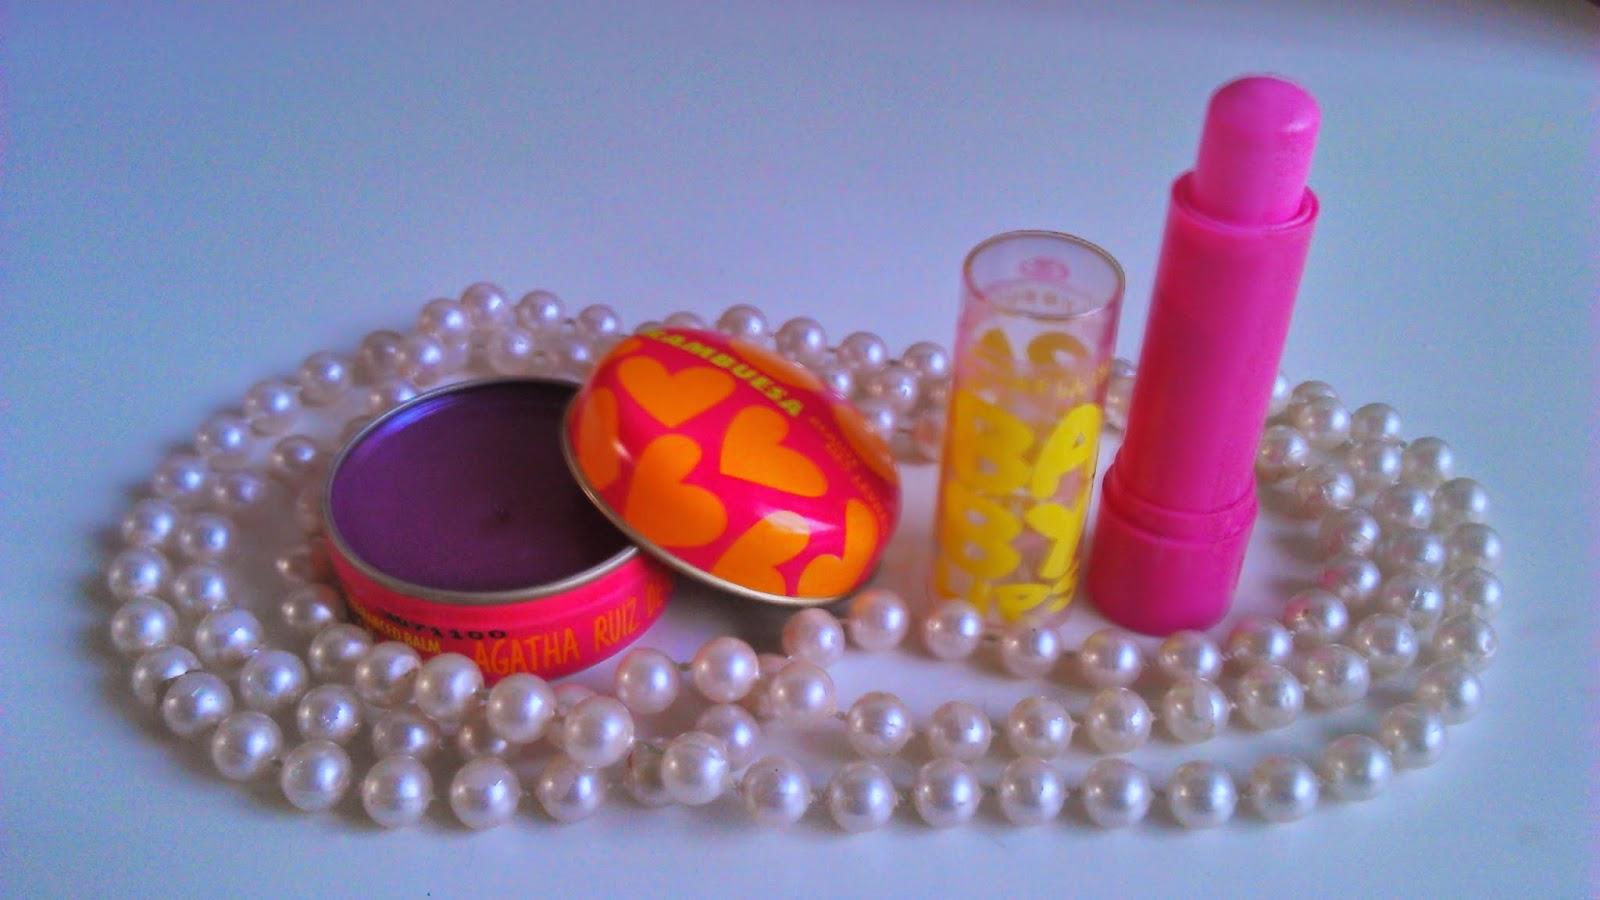 1 LipBalm Agatha Ruiz de La Padra, cor Framboesa; 2 Baby Lips Maybelline, cor Pink Punch